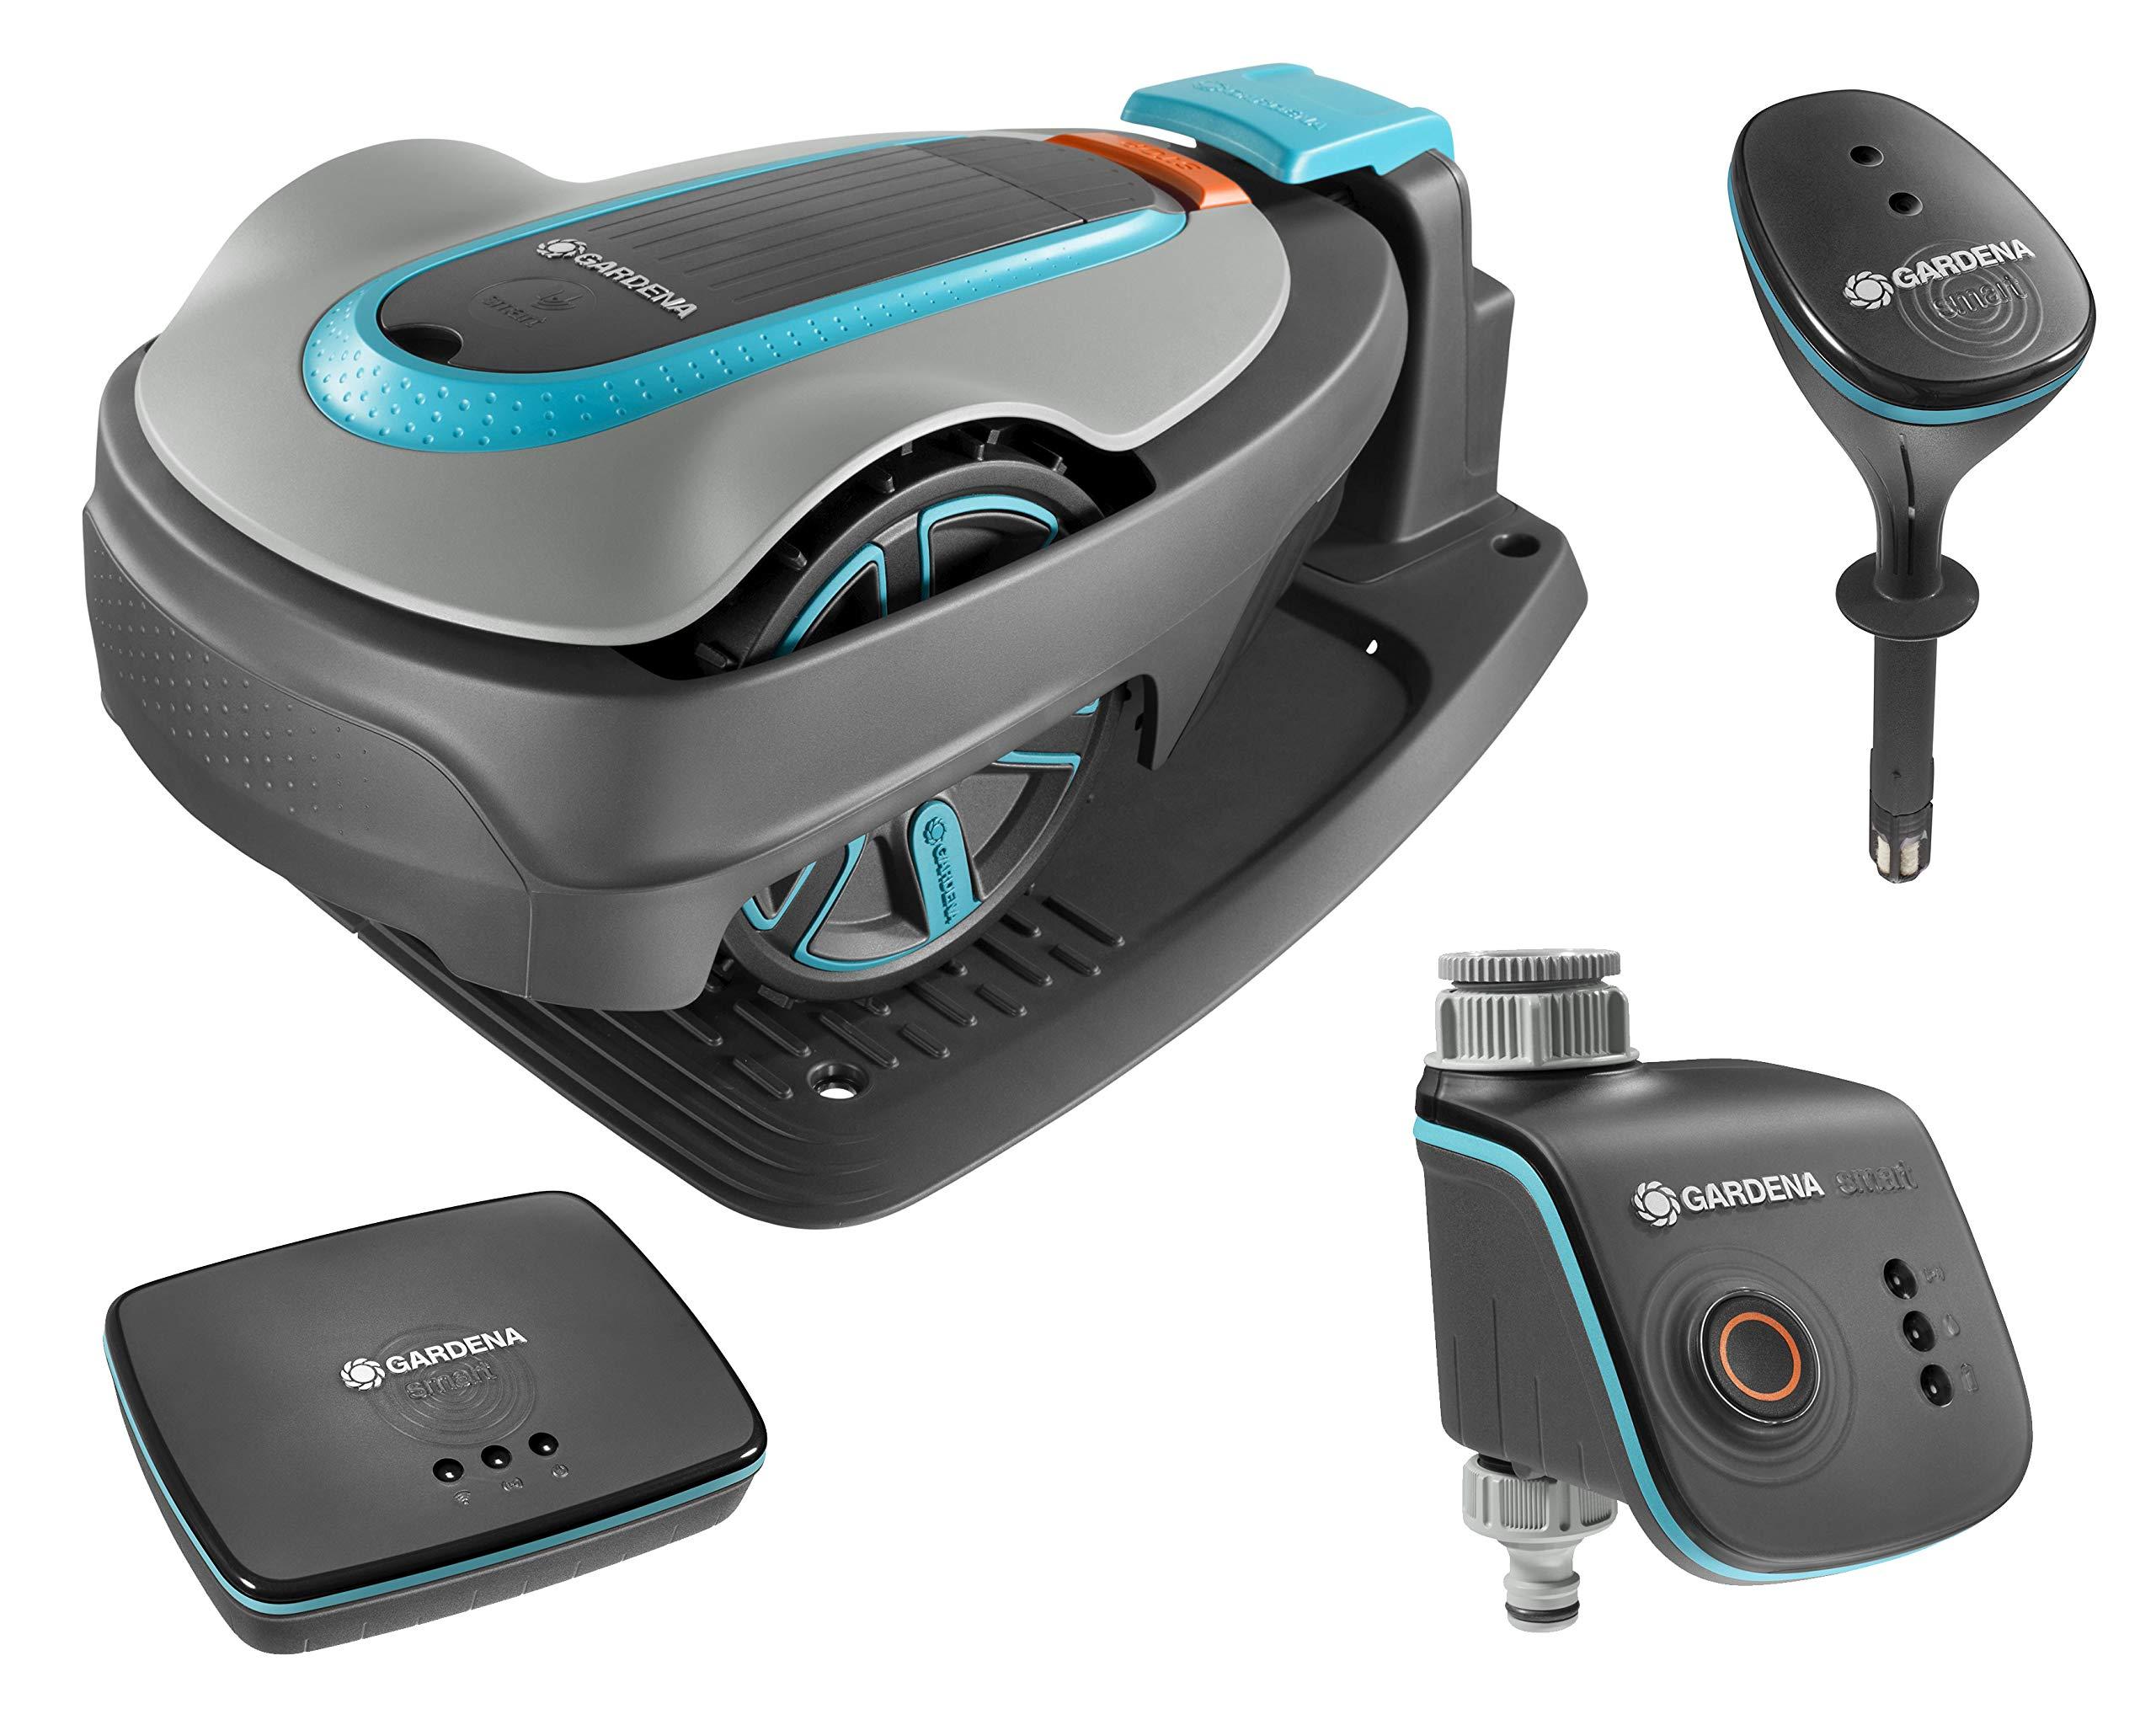 GARDENA-smart-system-Set-Mhroboter-smart-Sileno